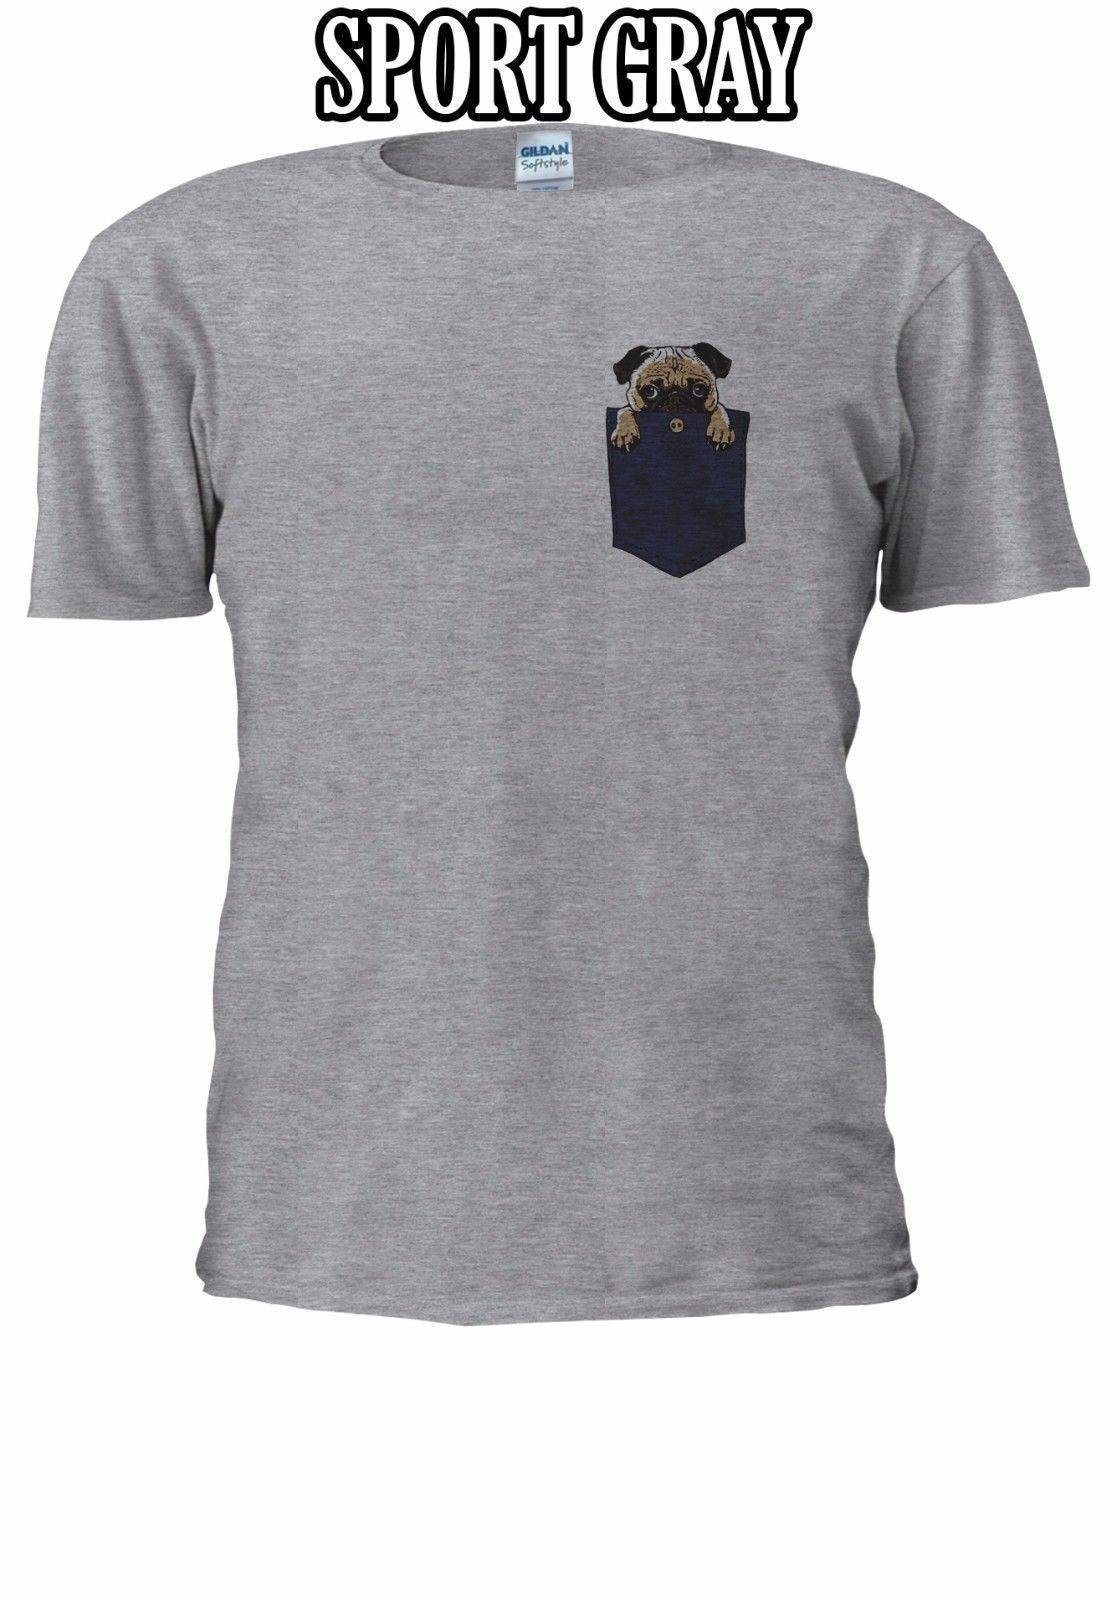 02bbdfee1f1 Create My Own T Shirt For Cheap - Nils Stucki Kieferorthopäde